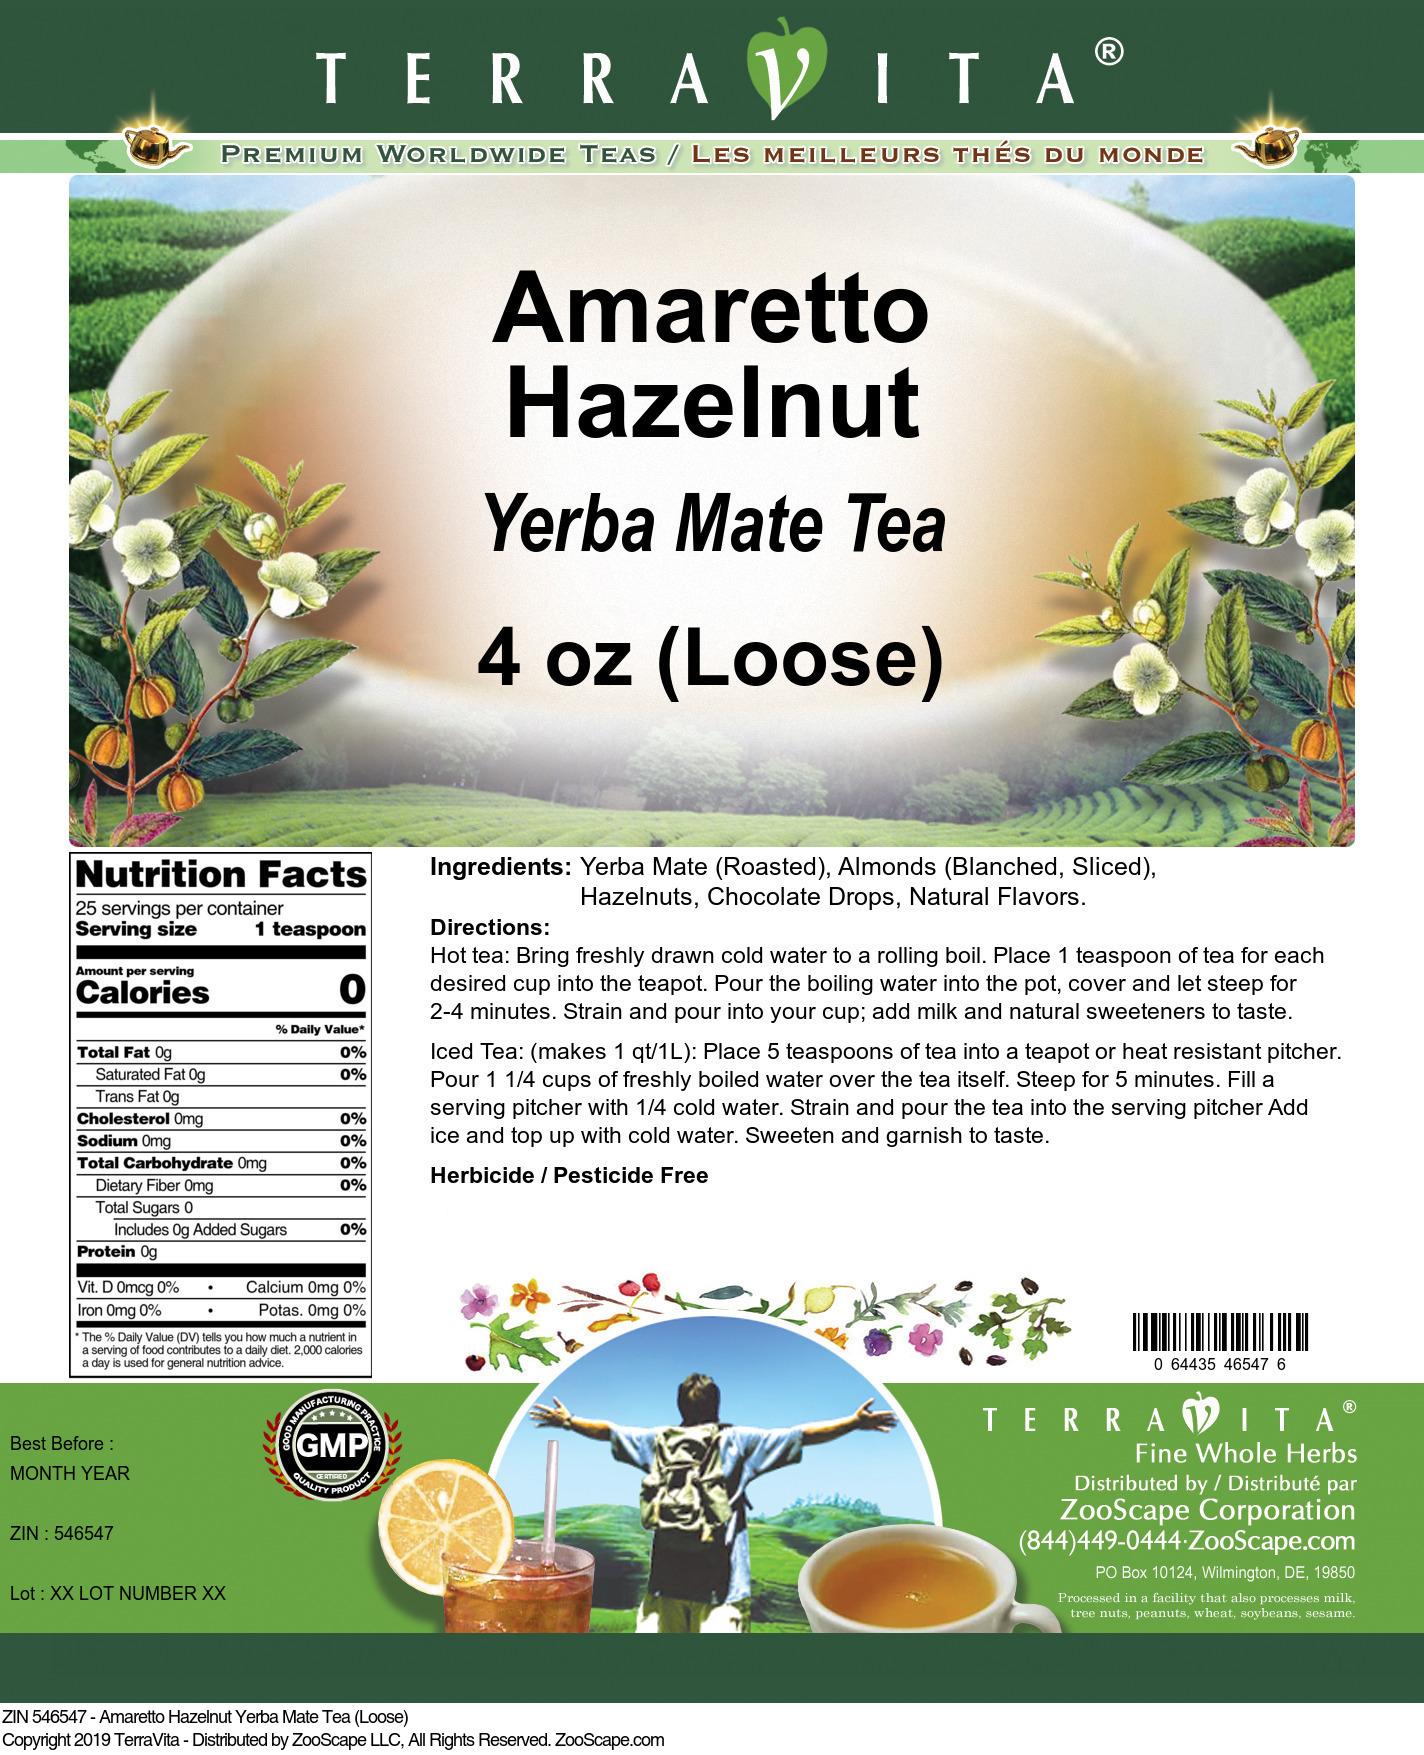 Amaretto Hazelnut Yerba Mate